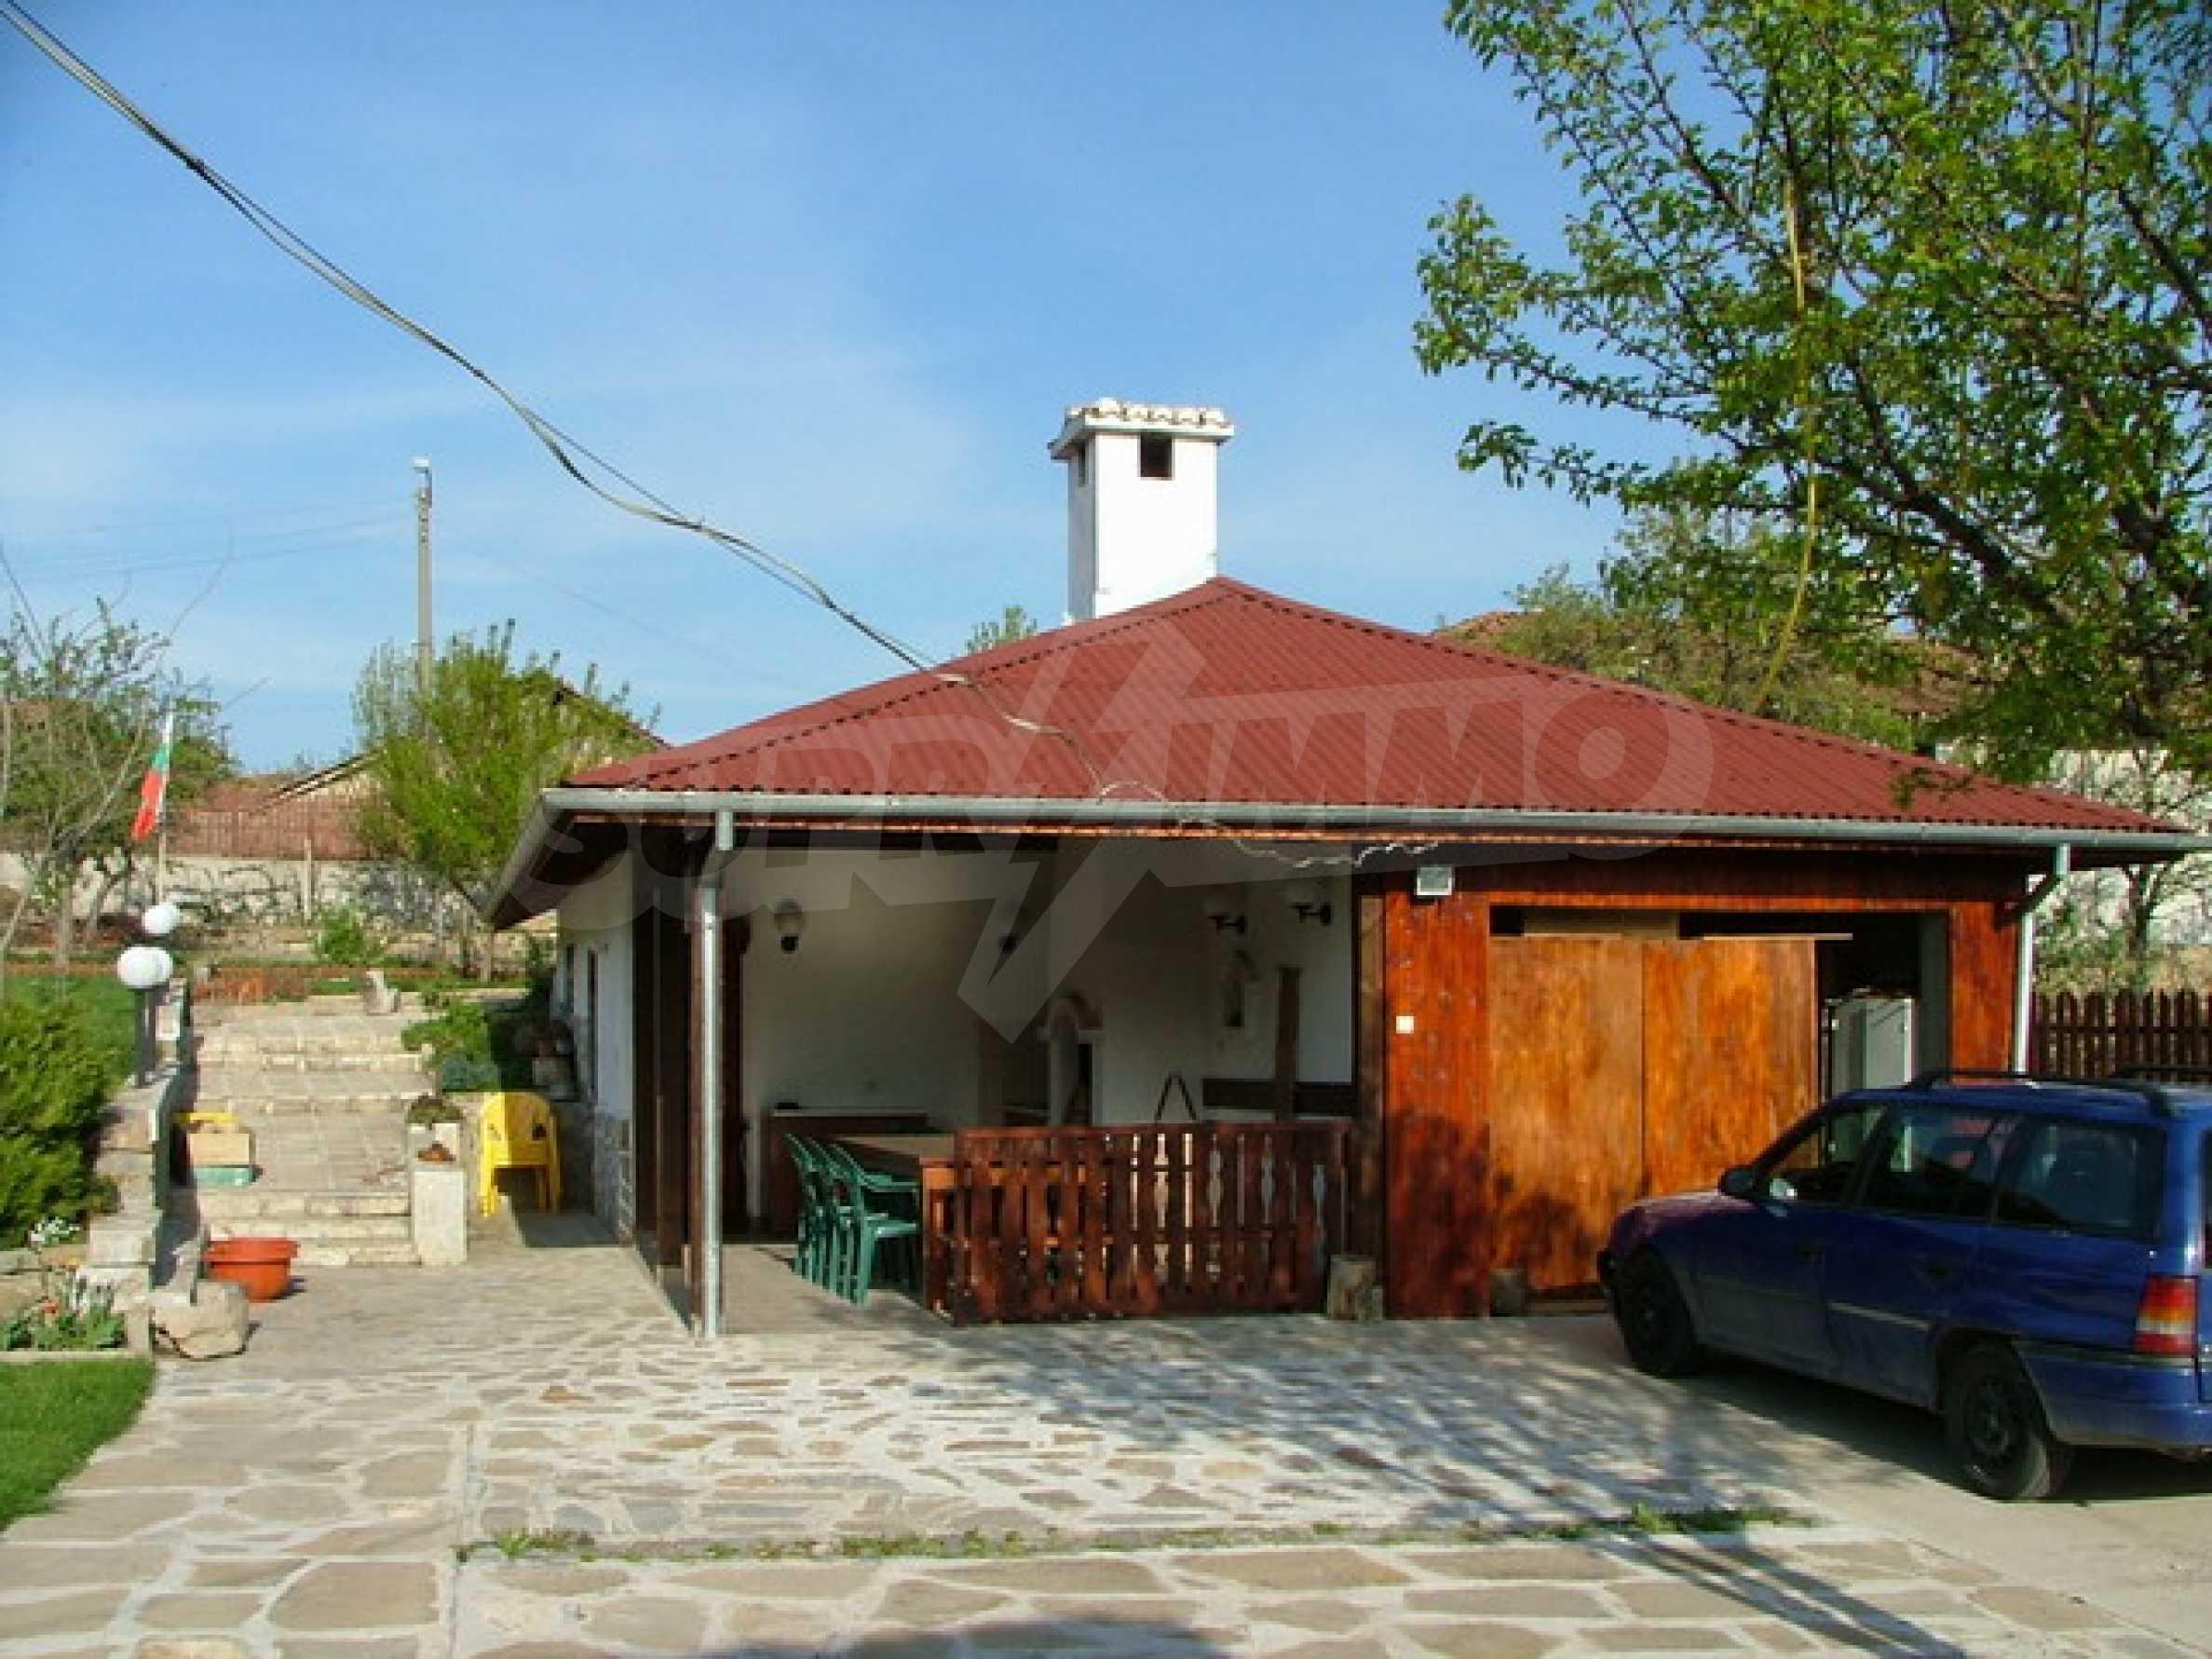 Stilvoll renovierte Villa 12 km entfernt. von Veliko Tarnovo 22